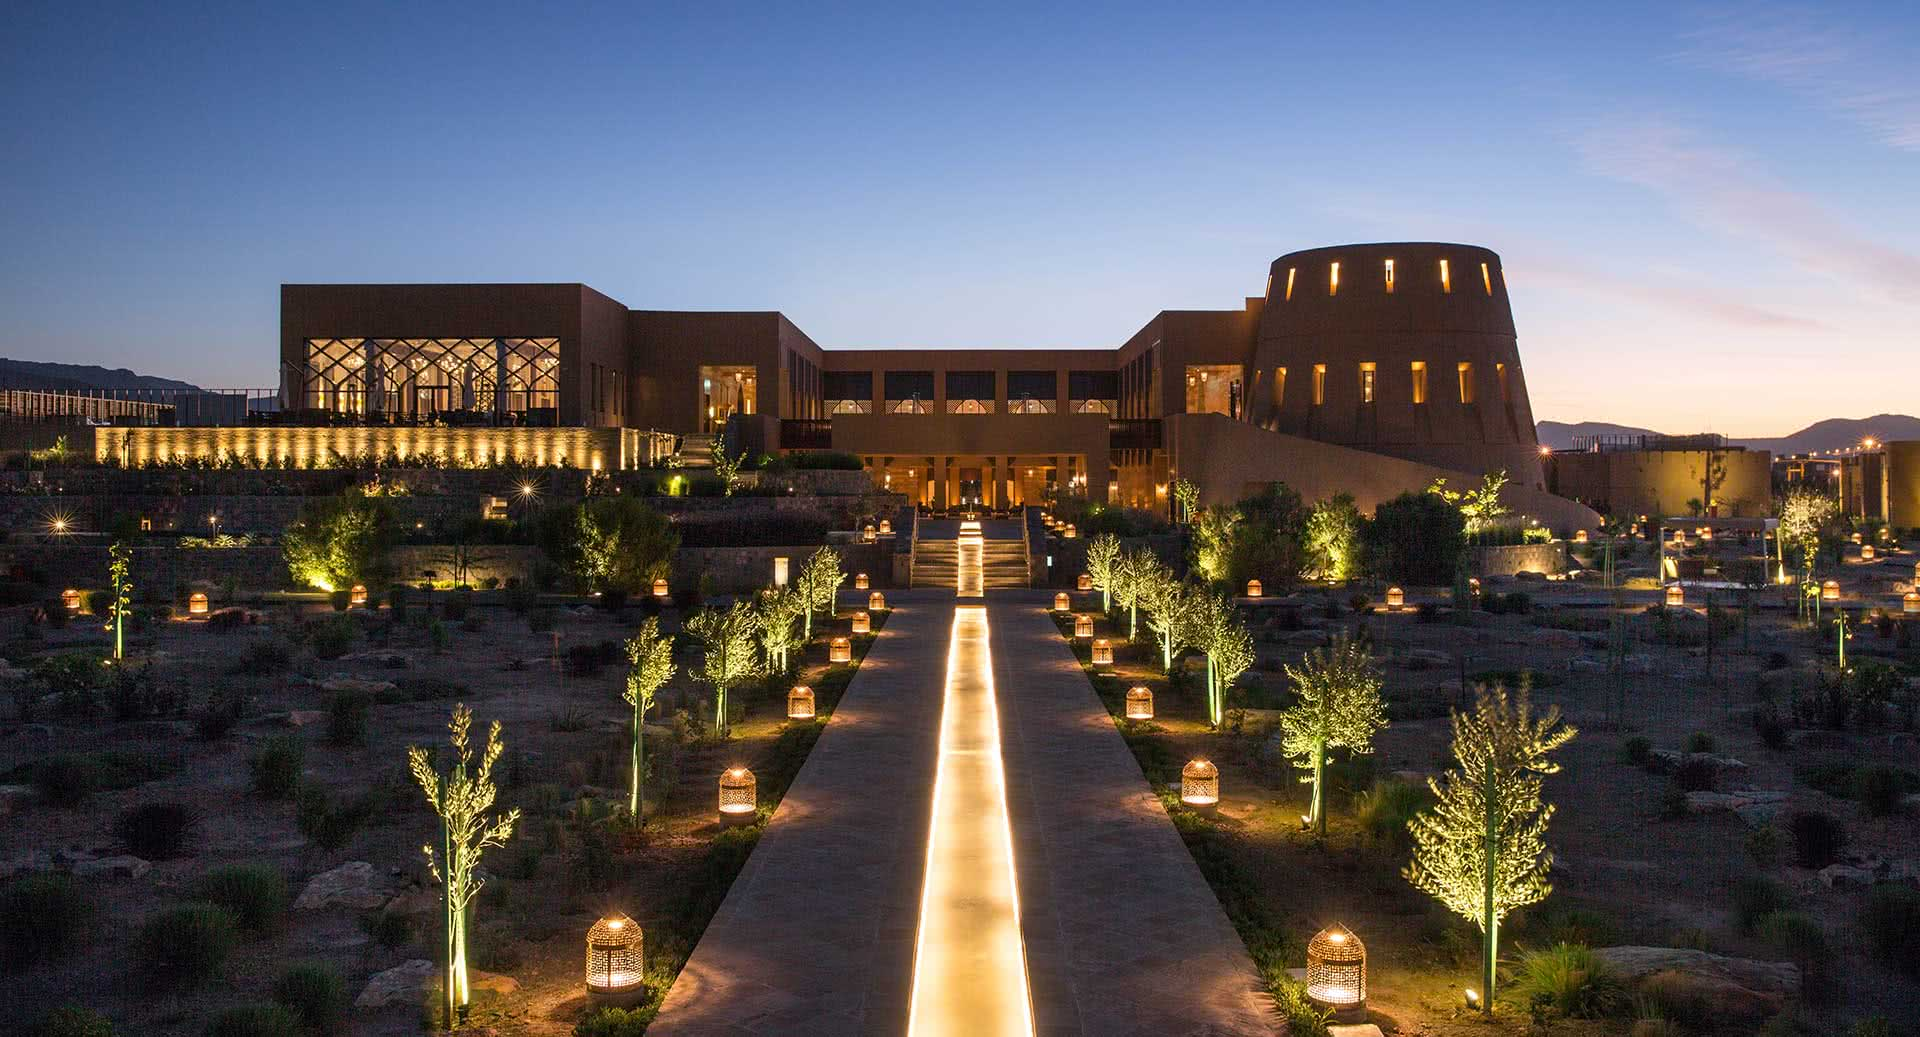 Anantara Al Jabal Al Akhdar Resort Hotelansicht bei Nacht